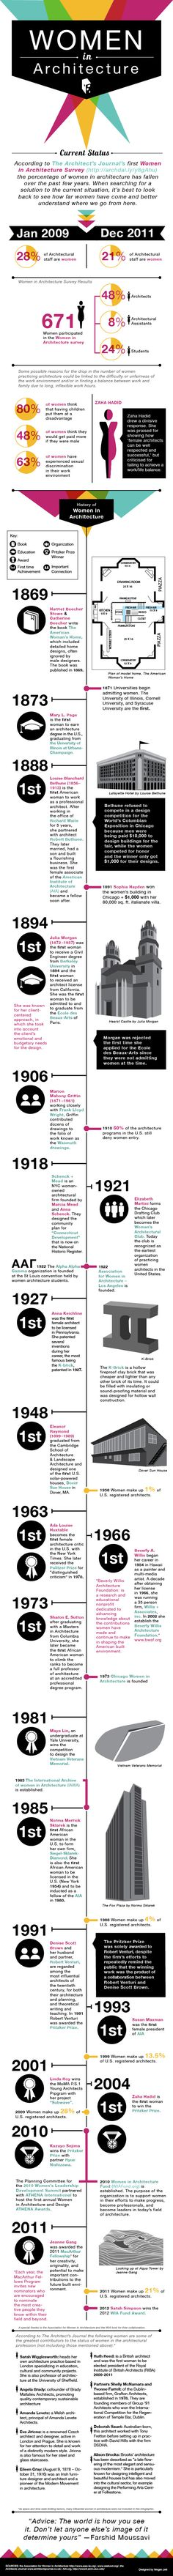 #Women in #Architecture